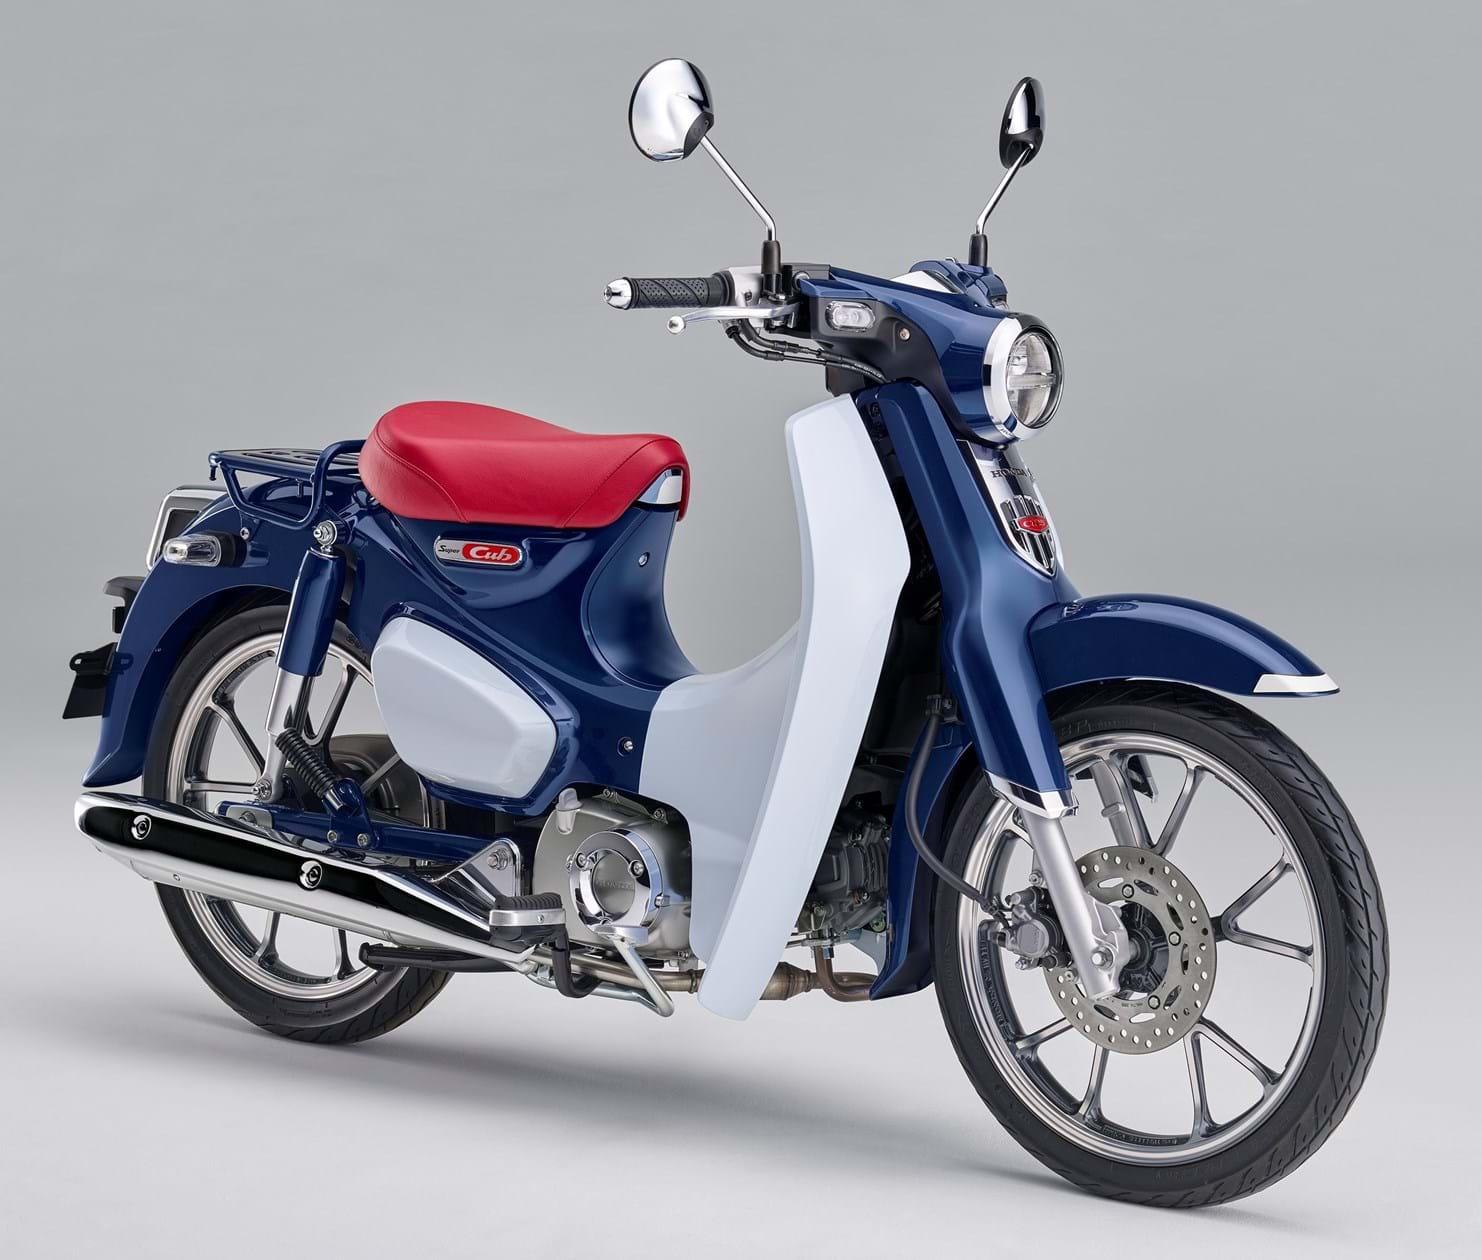 For Sale Honda Super Cub C125 The Bike Market Motorcycles History Price Guide Similar Bikes